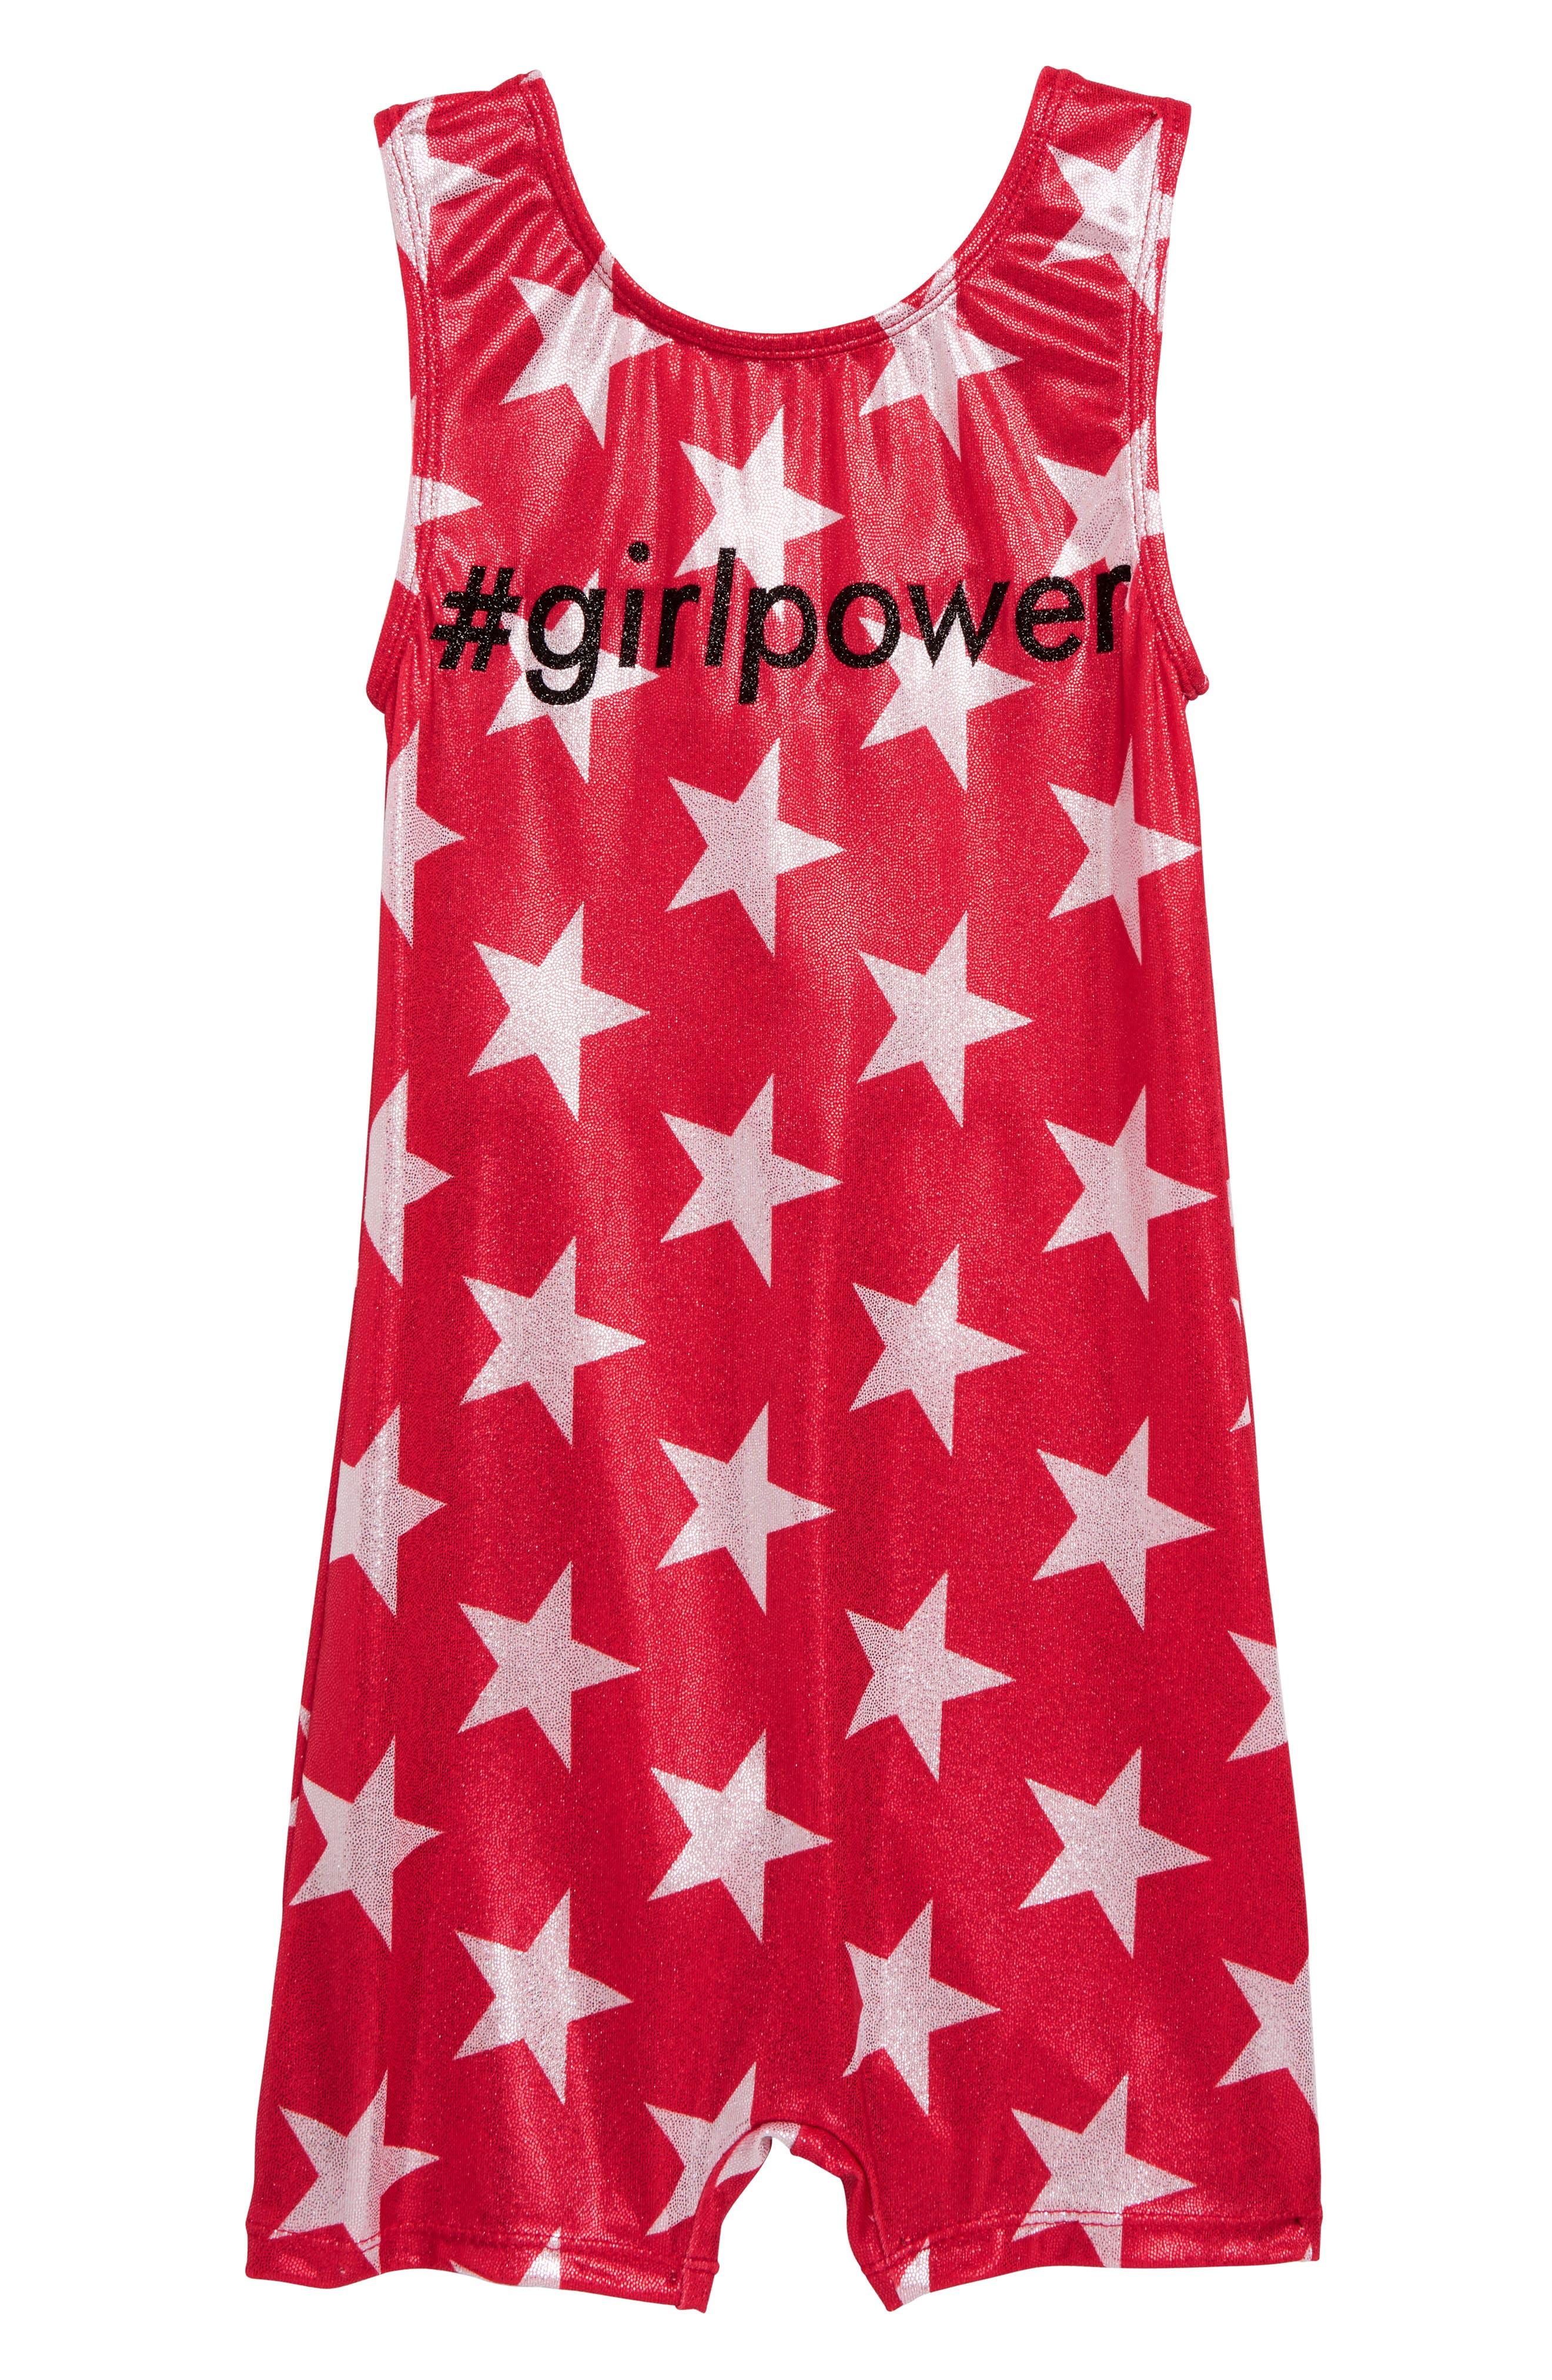 GP SPORT Girl Power Biketard, Main, color, RED